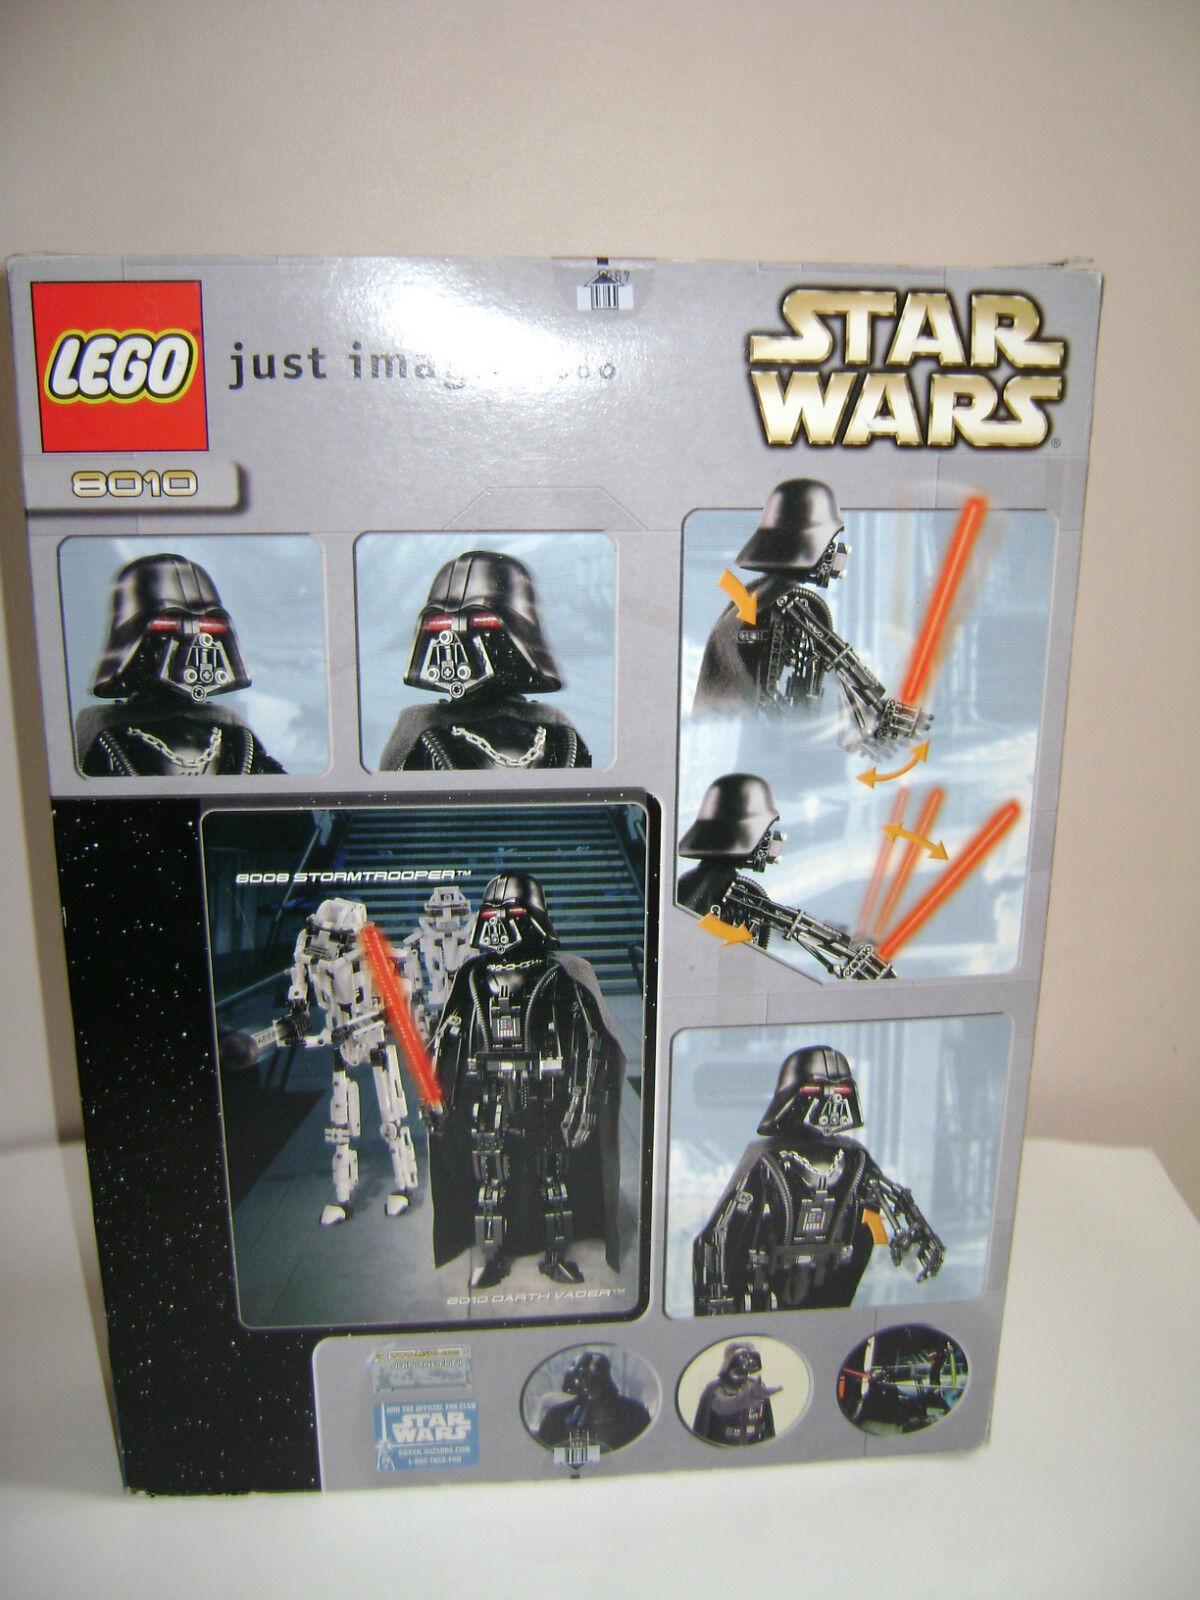 NEW LEGO STAR WARS WARS STAR 8010 RETIROT 2002 COMPLETE RARE DARTH VADER SEALED IN BOX 1e13f9